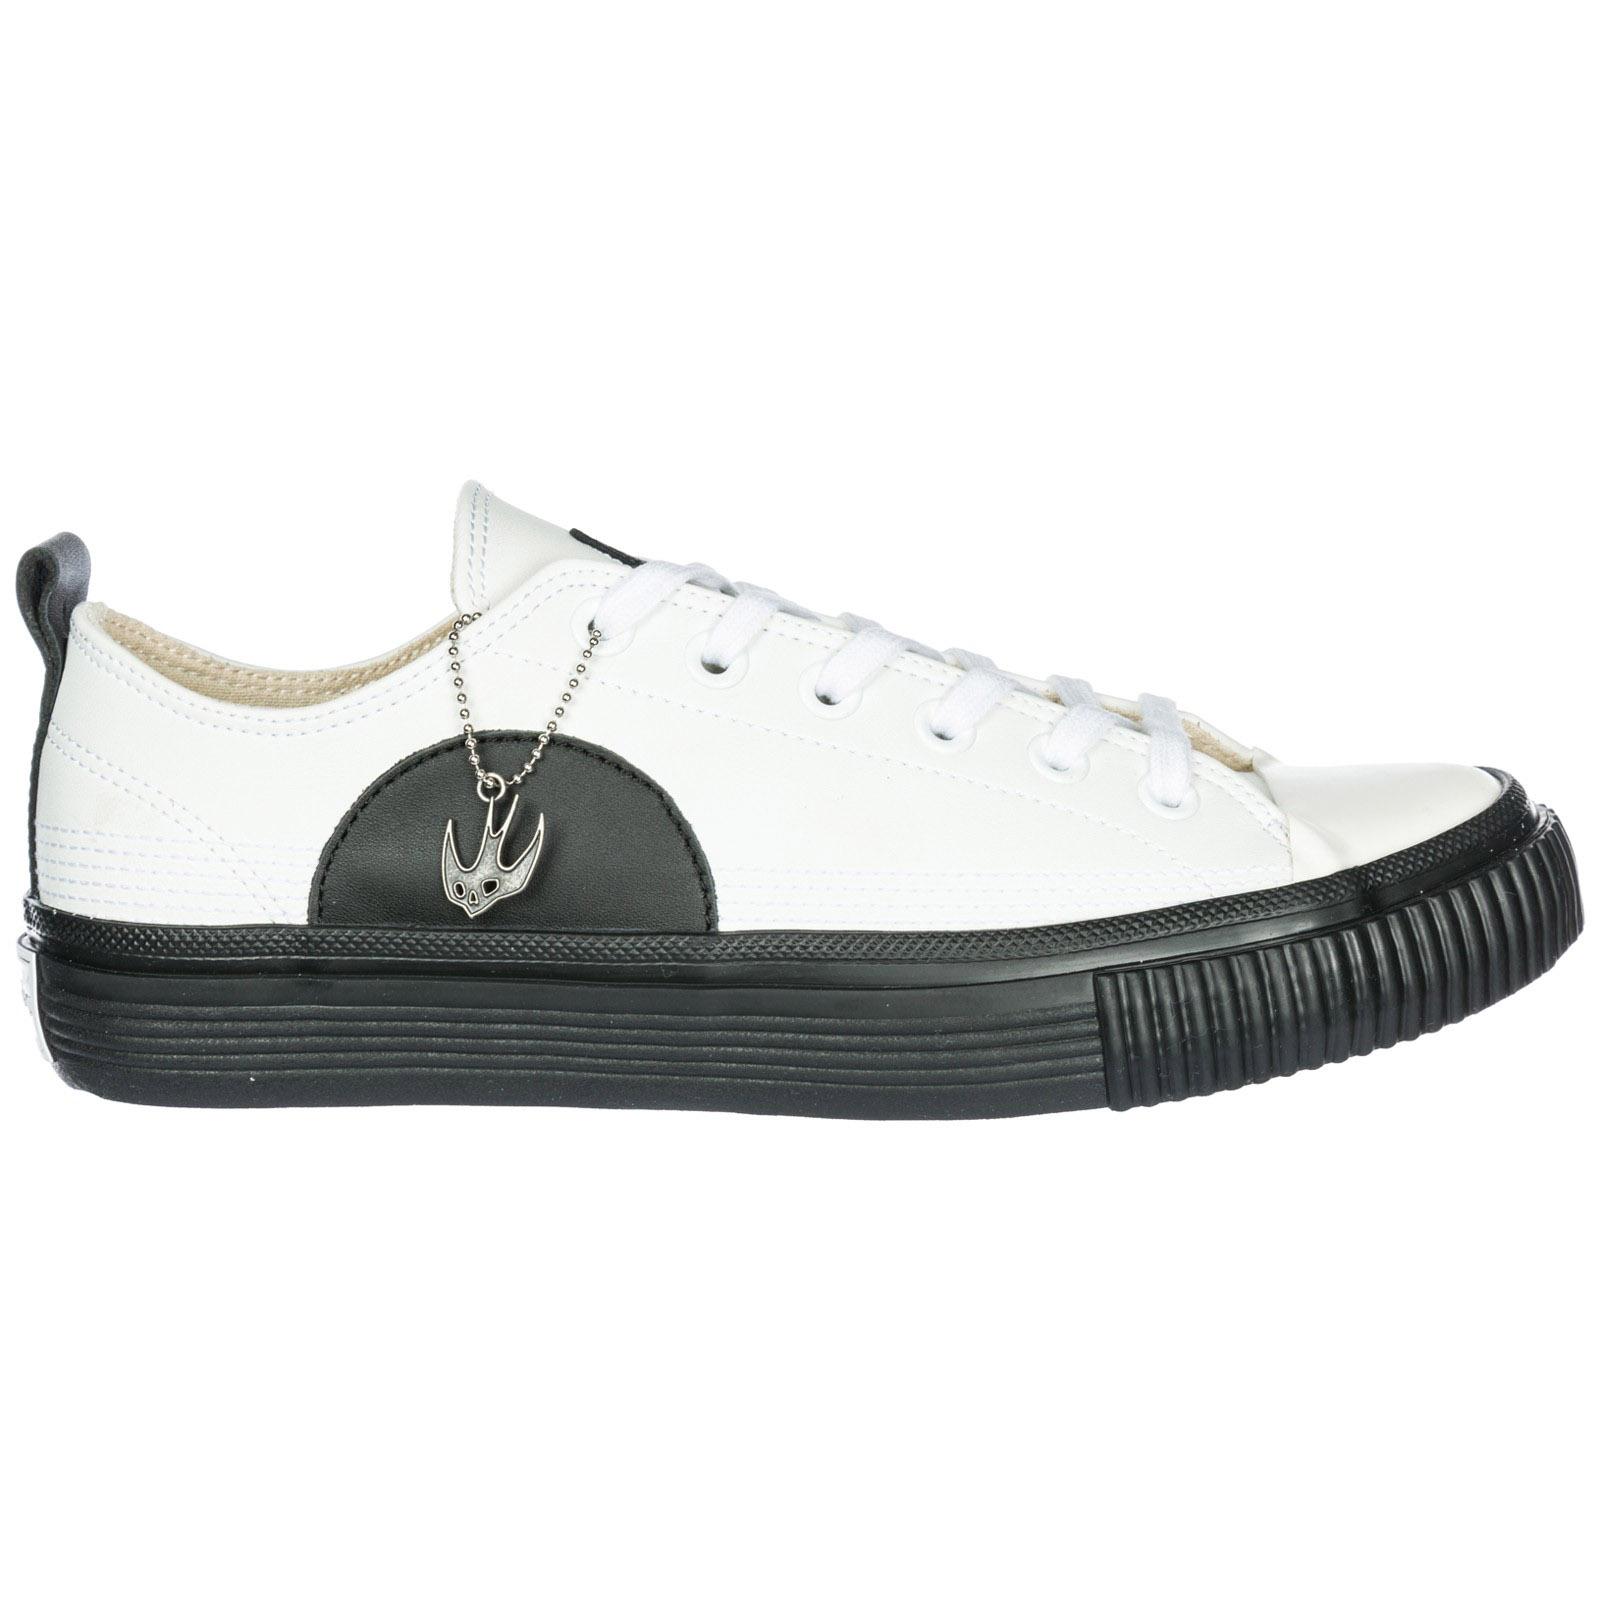 c155a8264670 Basket MCQ Alexander McQueen Swallow Plimsoll 472452R11299024 white ...